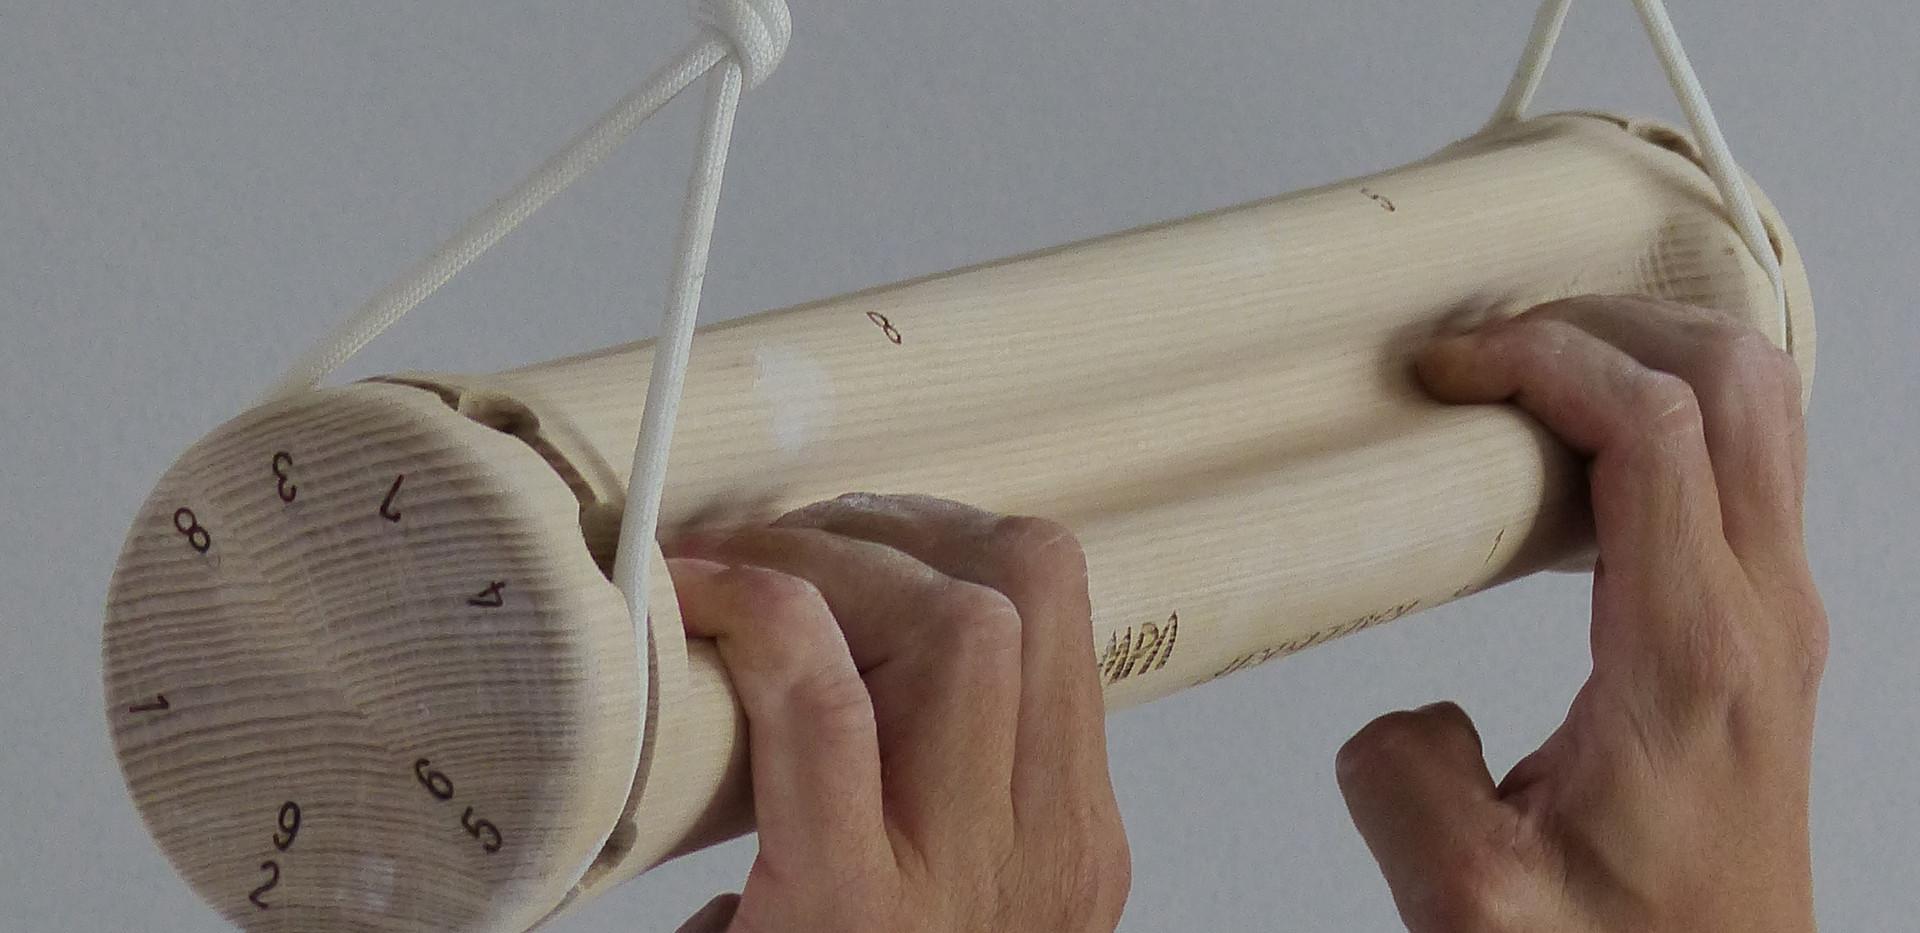 RallGrip Portable fingerboard